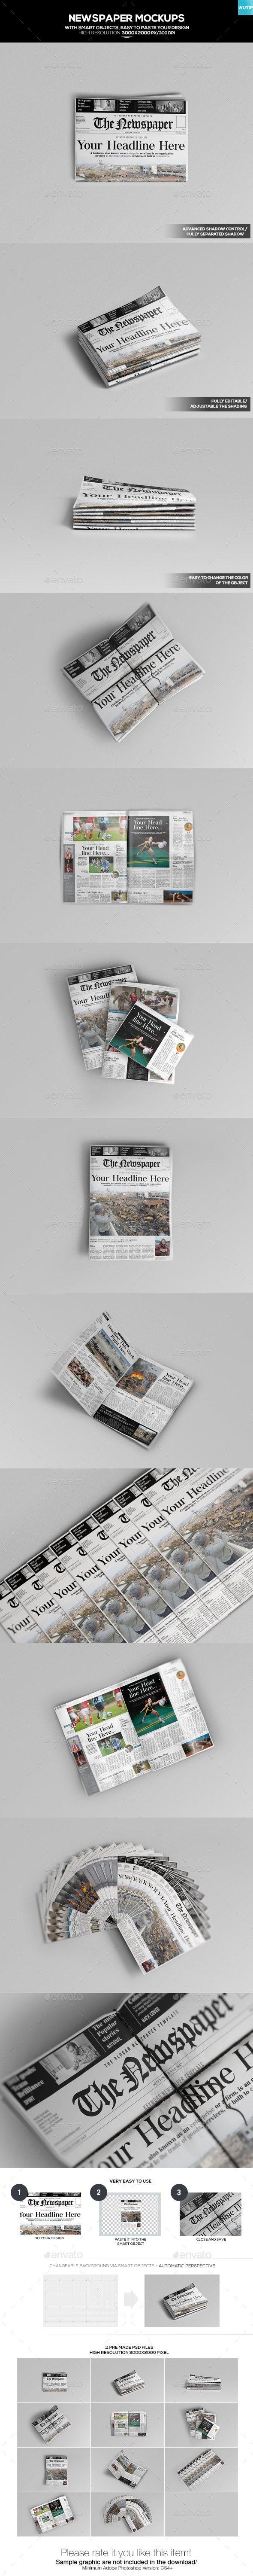 Download Newspaper Mockups 01